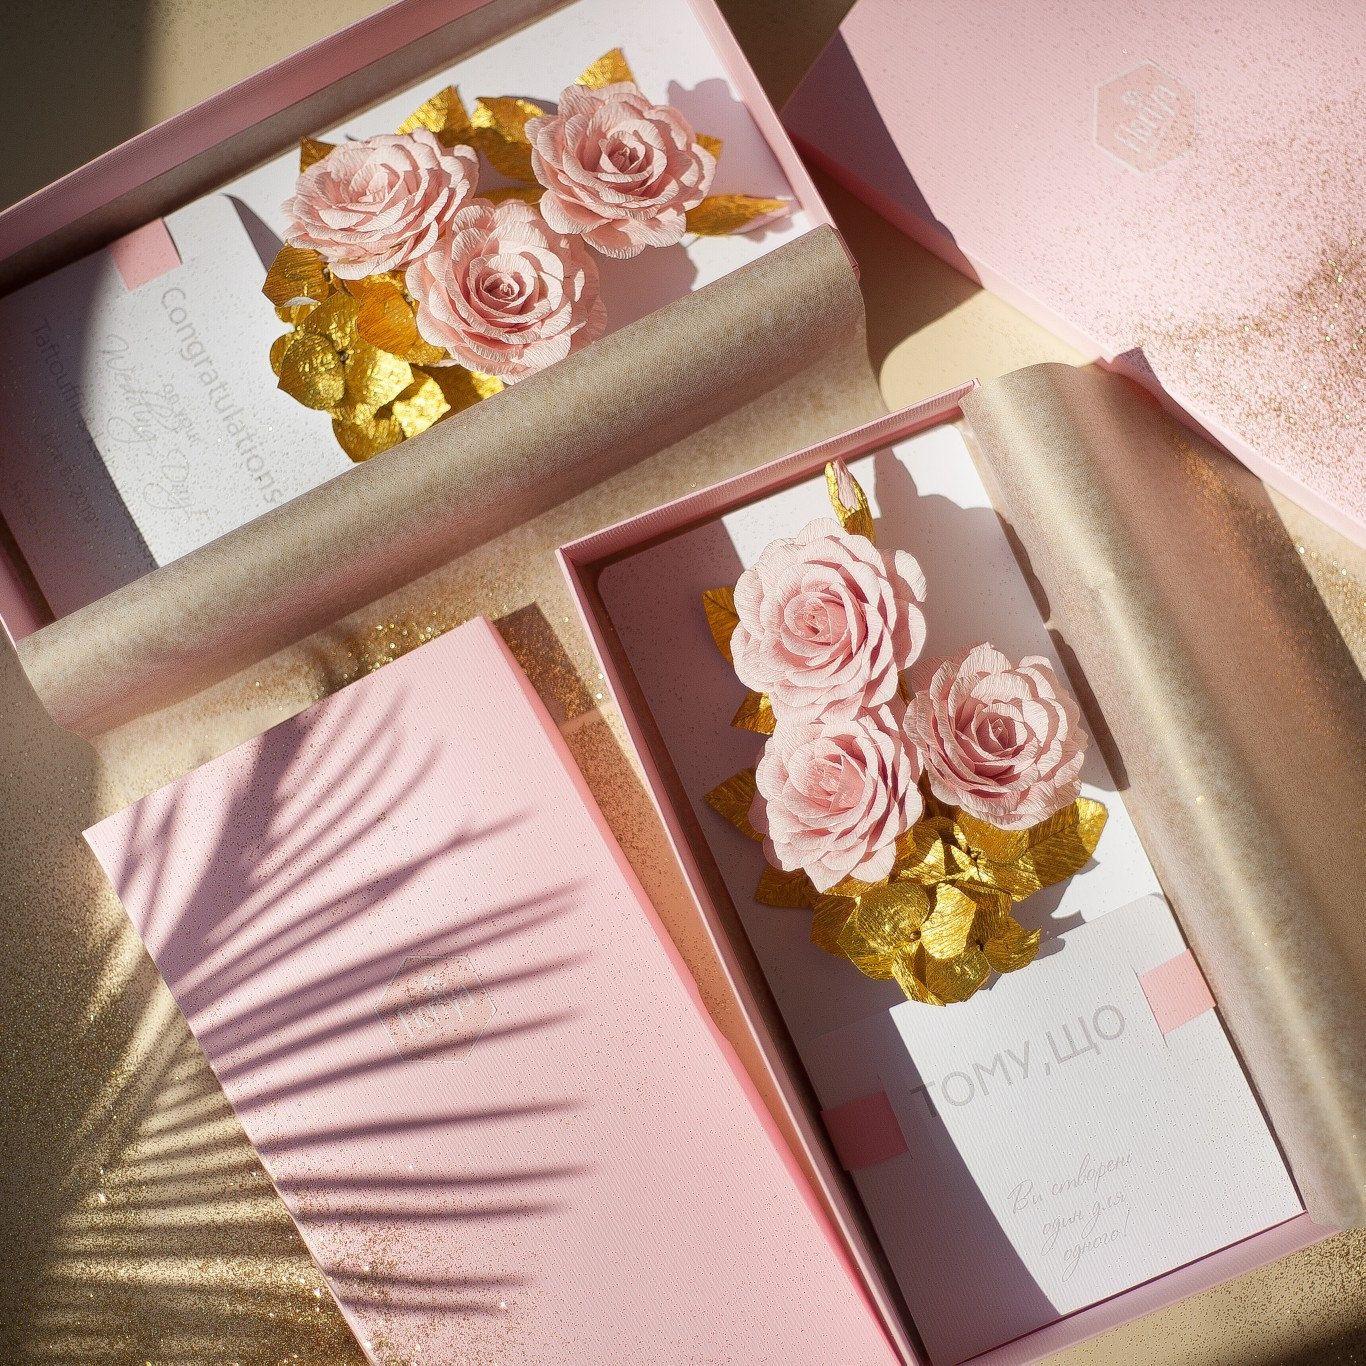 Wedding Money Envelope Cash Wedding Congratulations Card Etsy In 2020 Wedding Congratulations Card Wedding Congratulations Wedding Cards